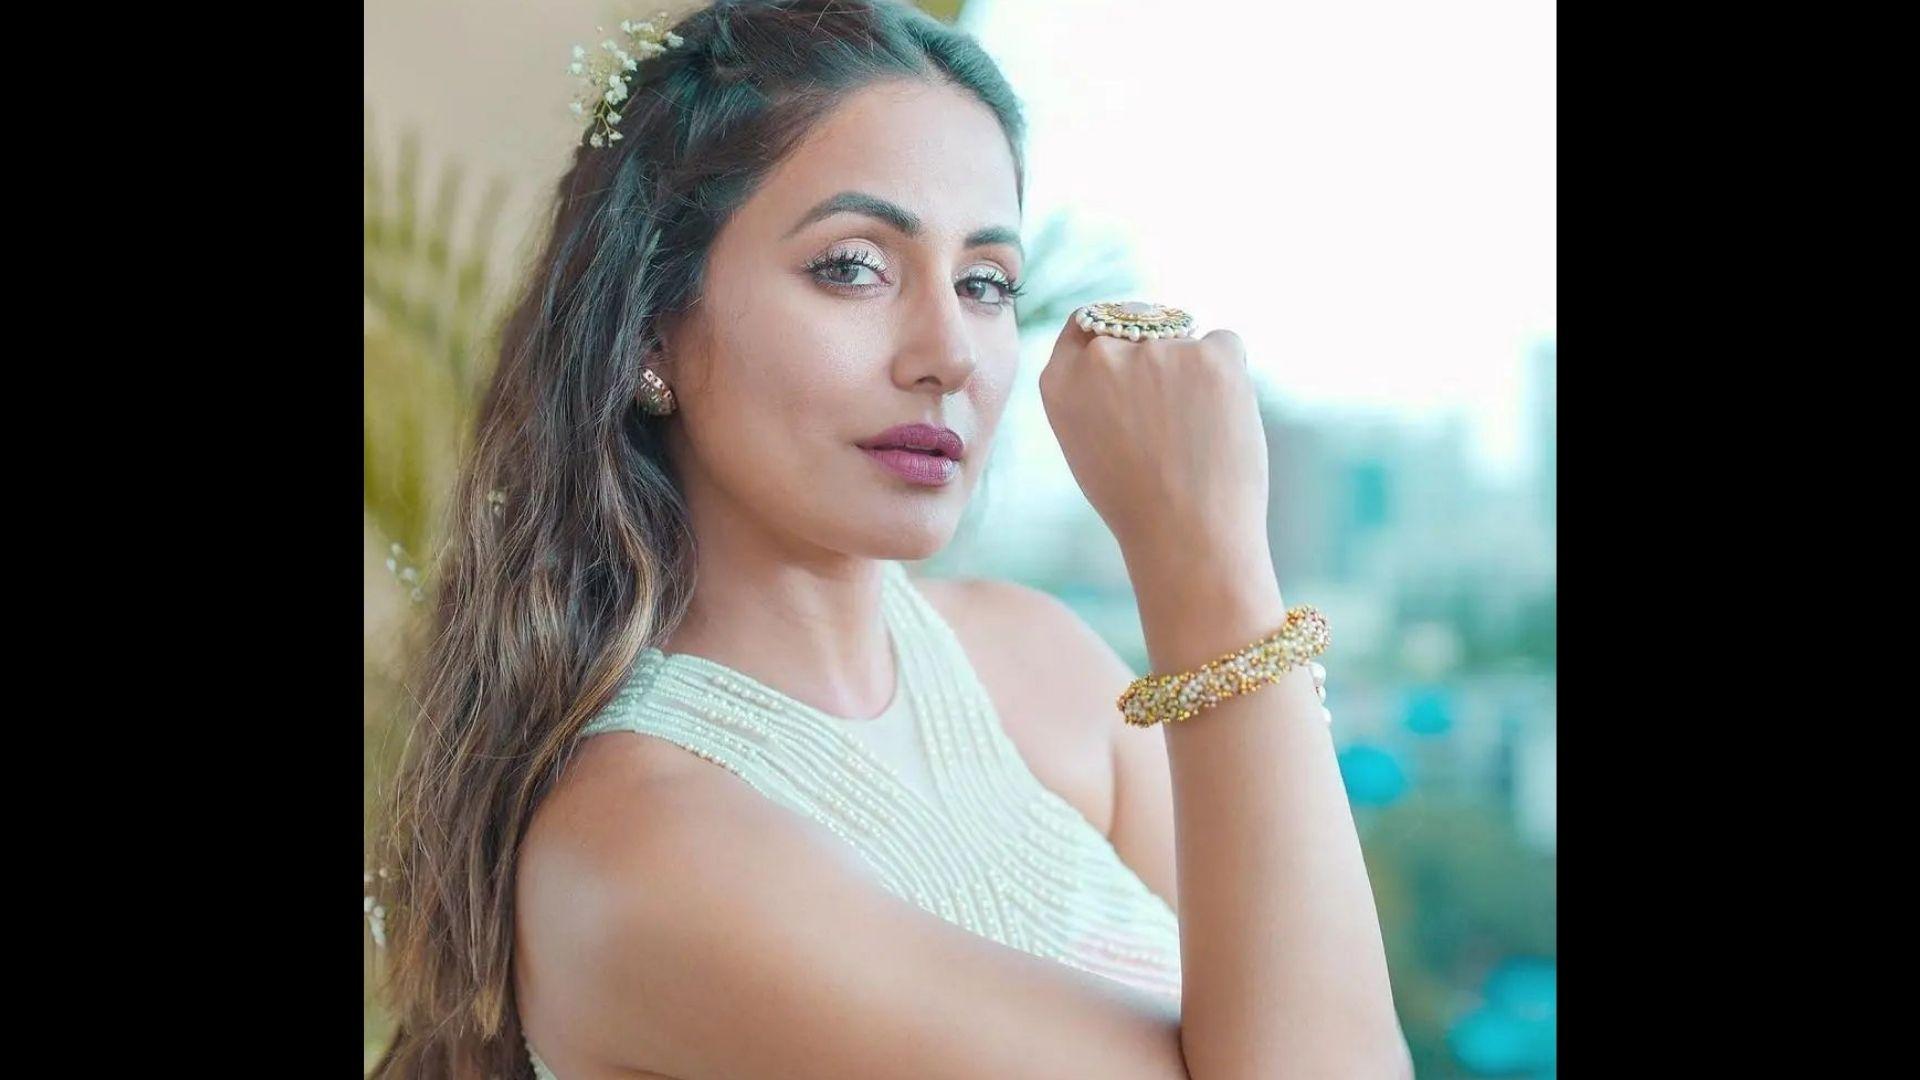 Bigg Boss 15: Hina Khan Calls Out BB Makers For Ongoing Violence On The Show; Asks Bigg Boss If Has Fallen In Love With Vishwasundari